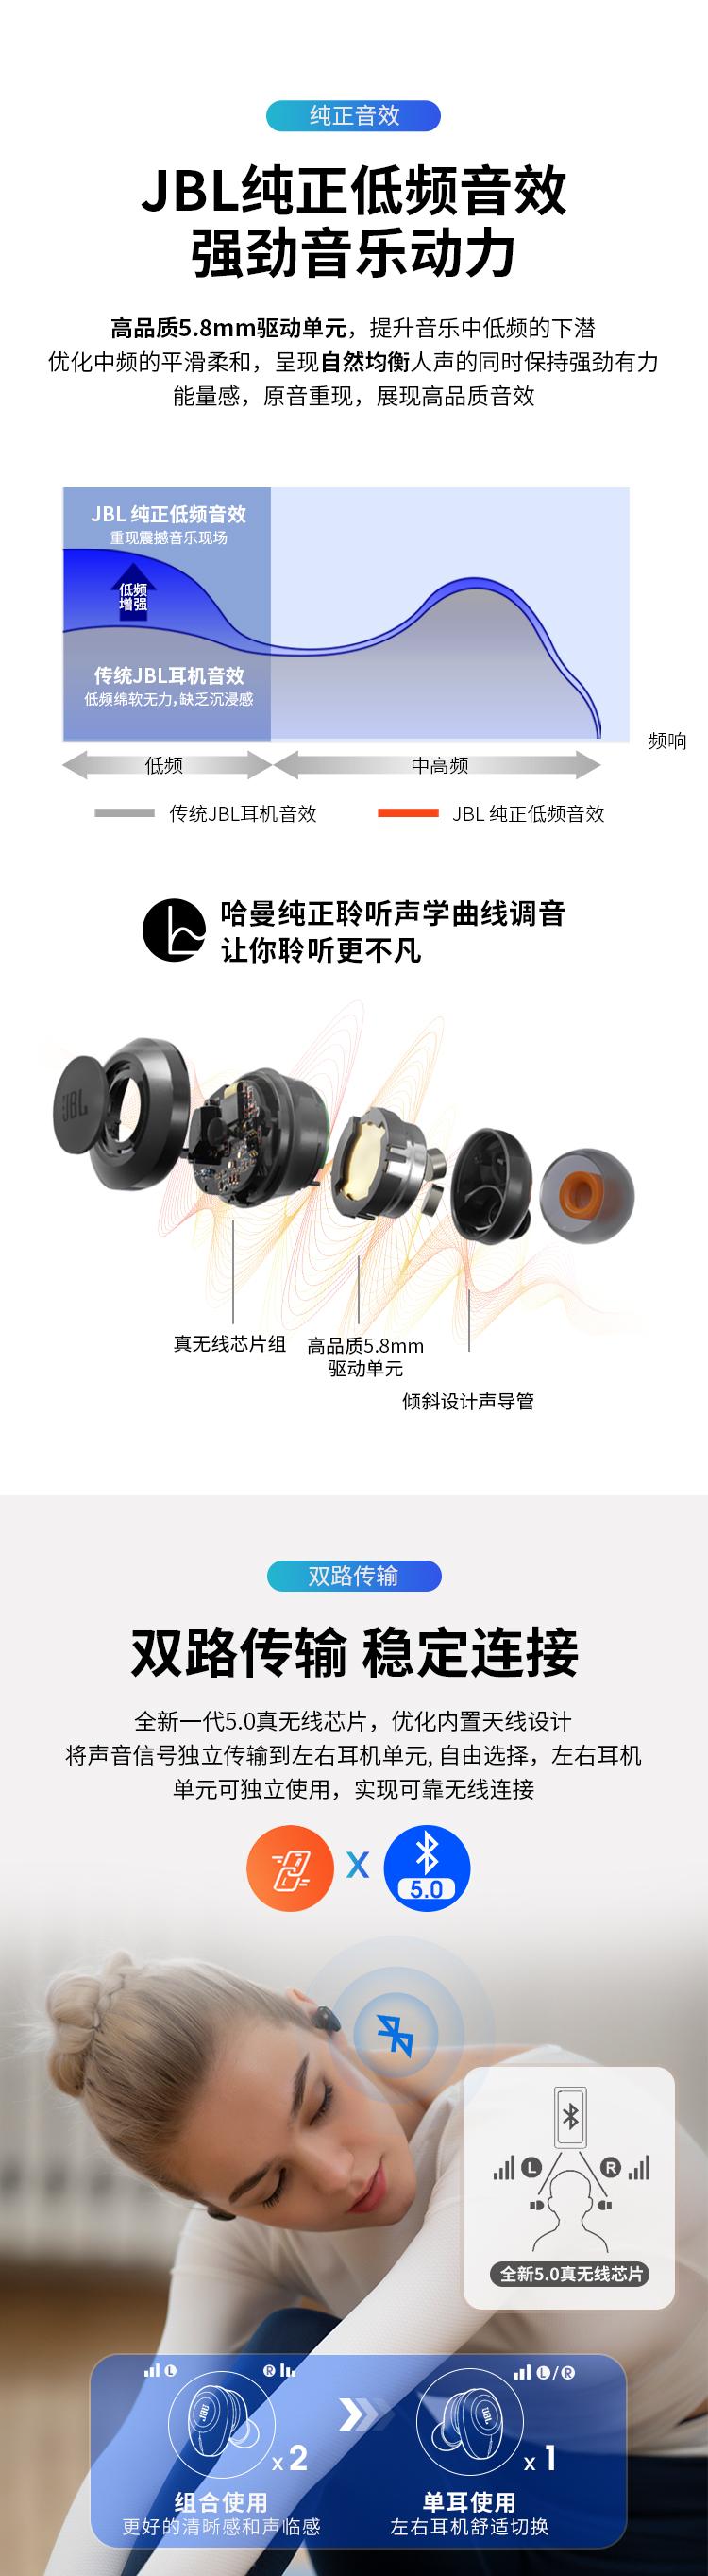 JBL TUNE125TWS 真无线蓝牙耳机 入耳式音乐耳机 双路连接 苹果华为小米手机通用 T120TWS升级版 玉石白